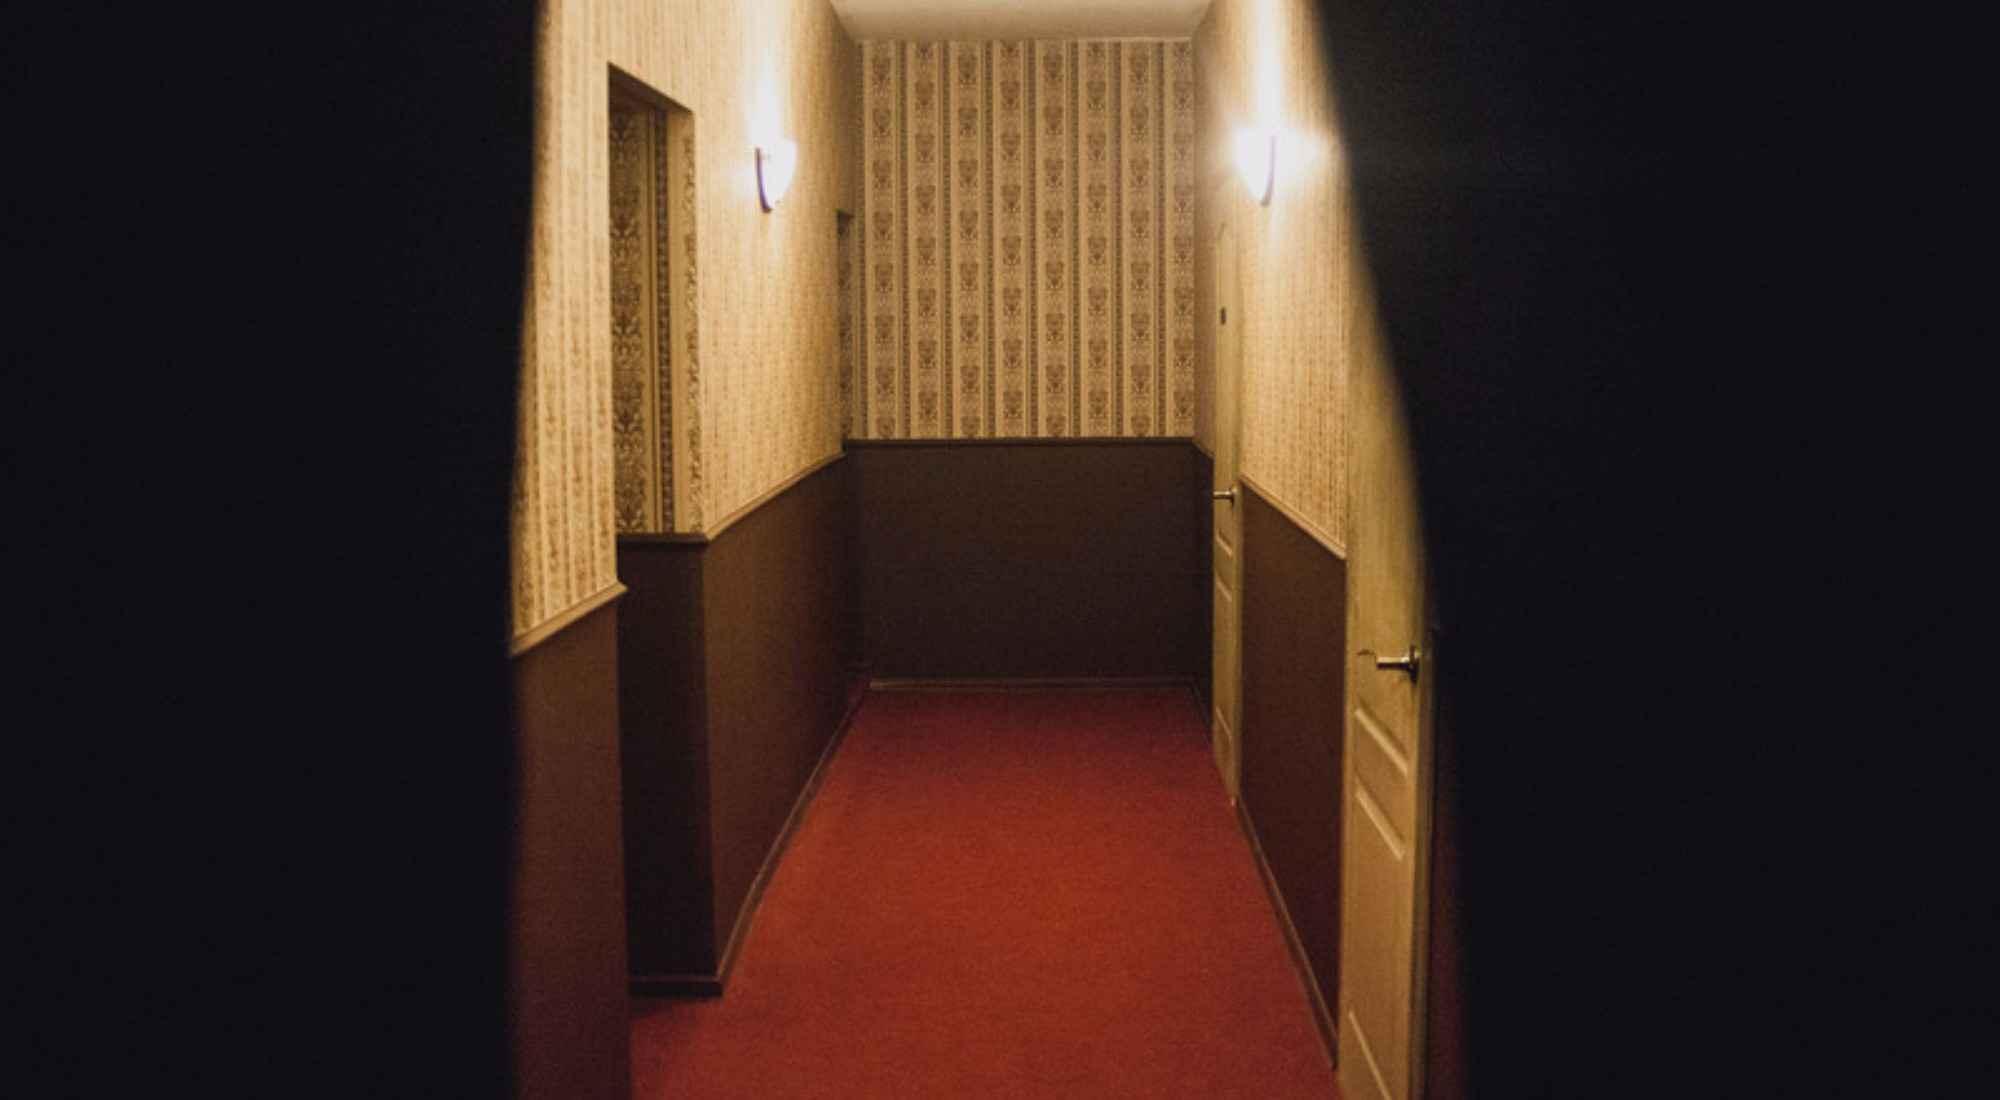 Квест 1408 в Набережных Челнах фото 4